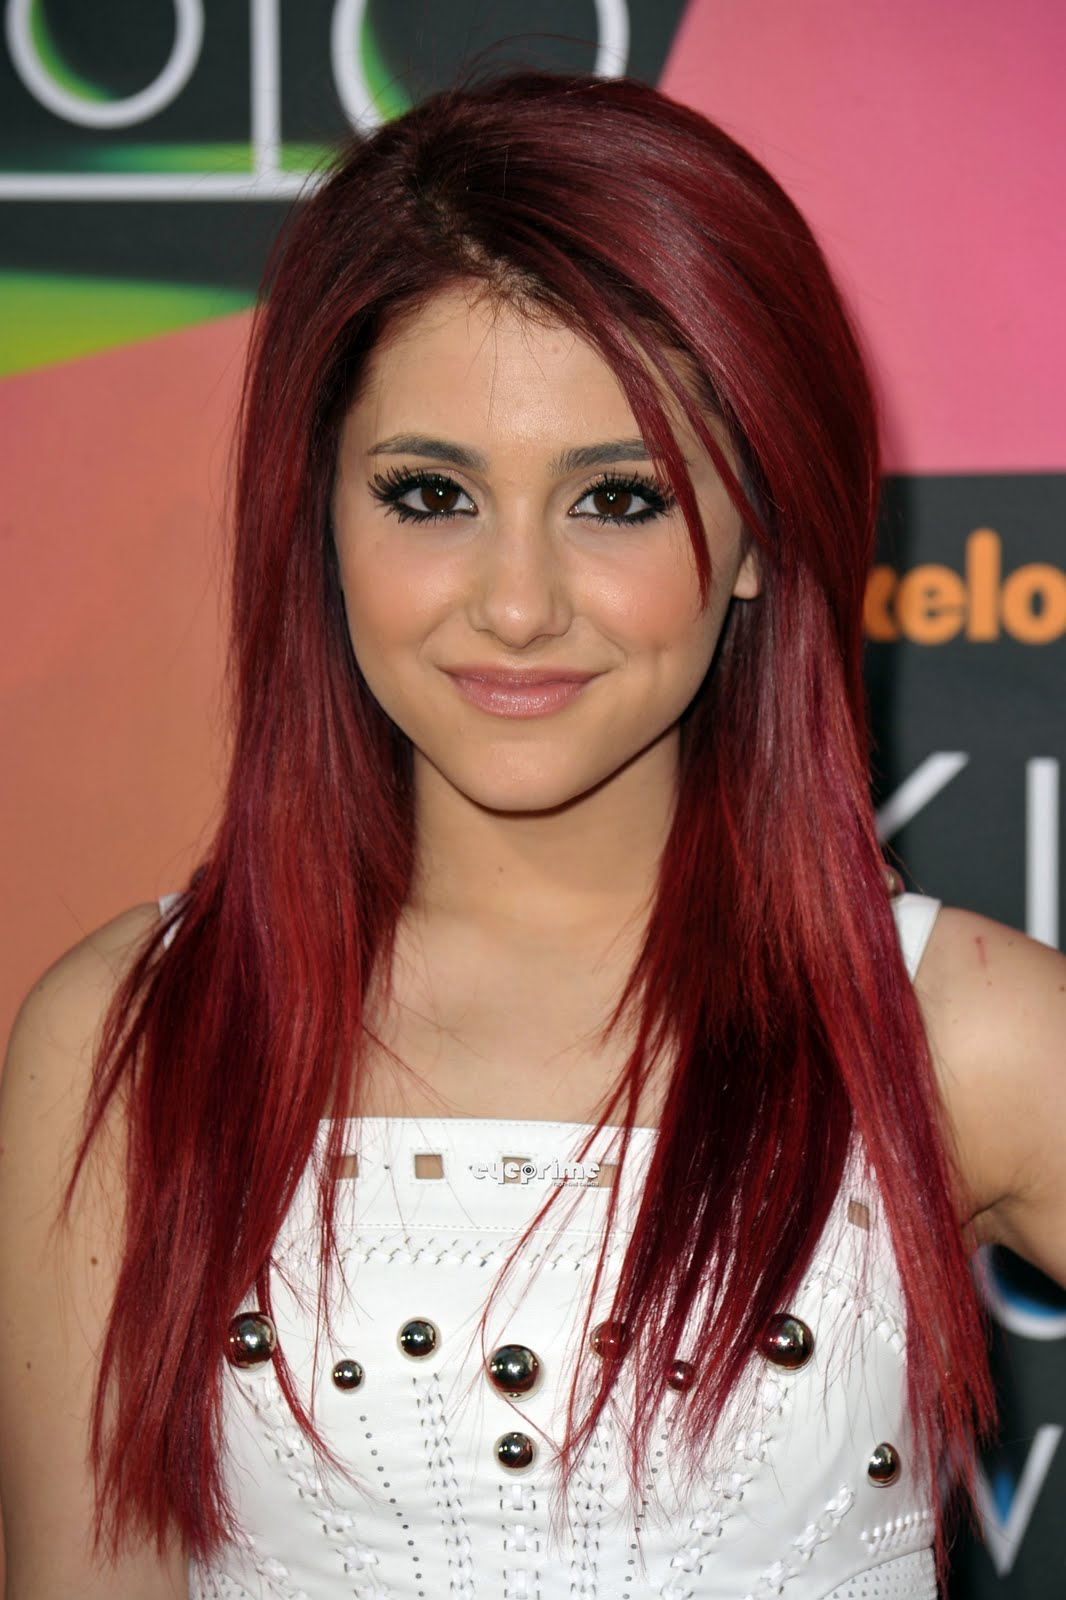 Ariana Grande Red Hair Dye